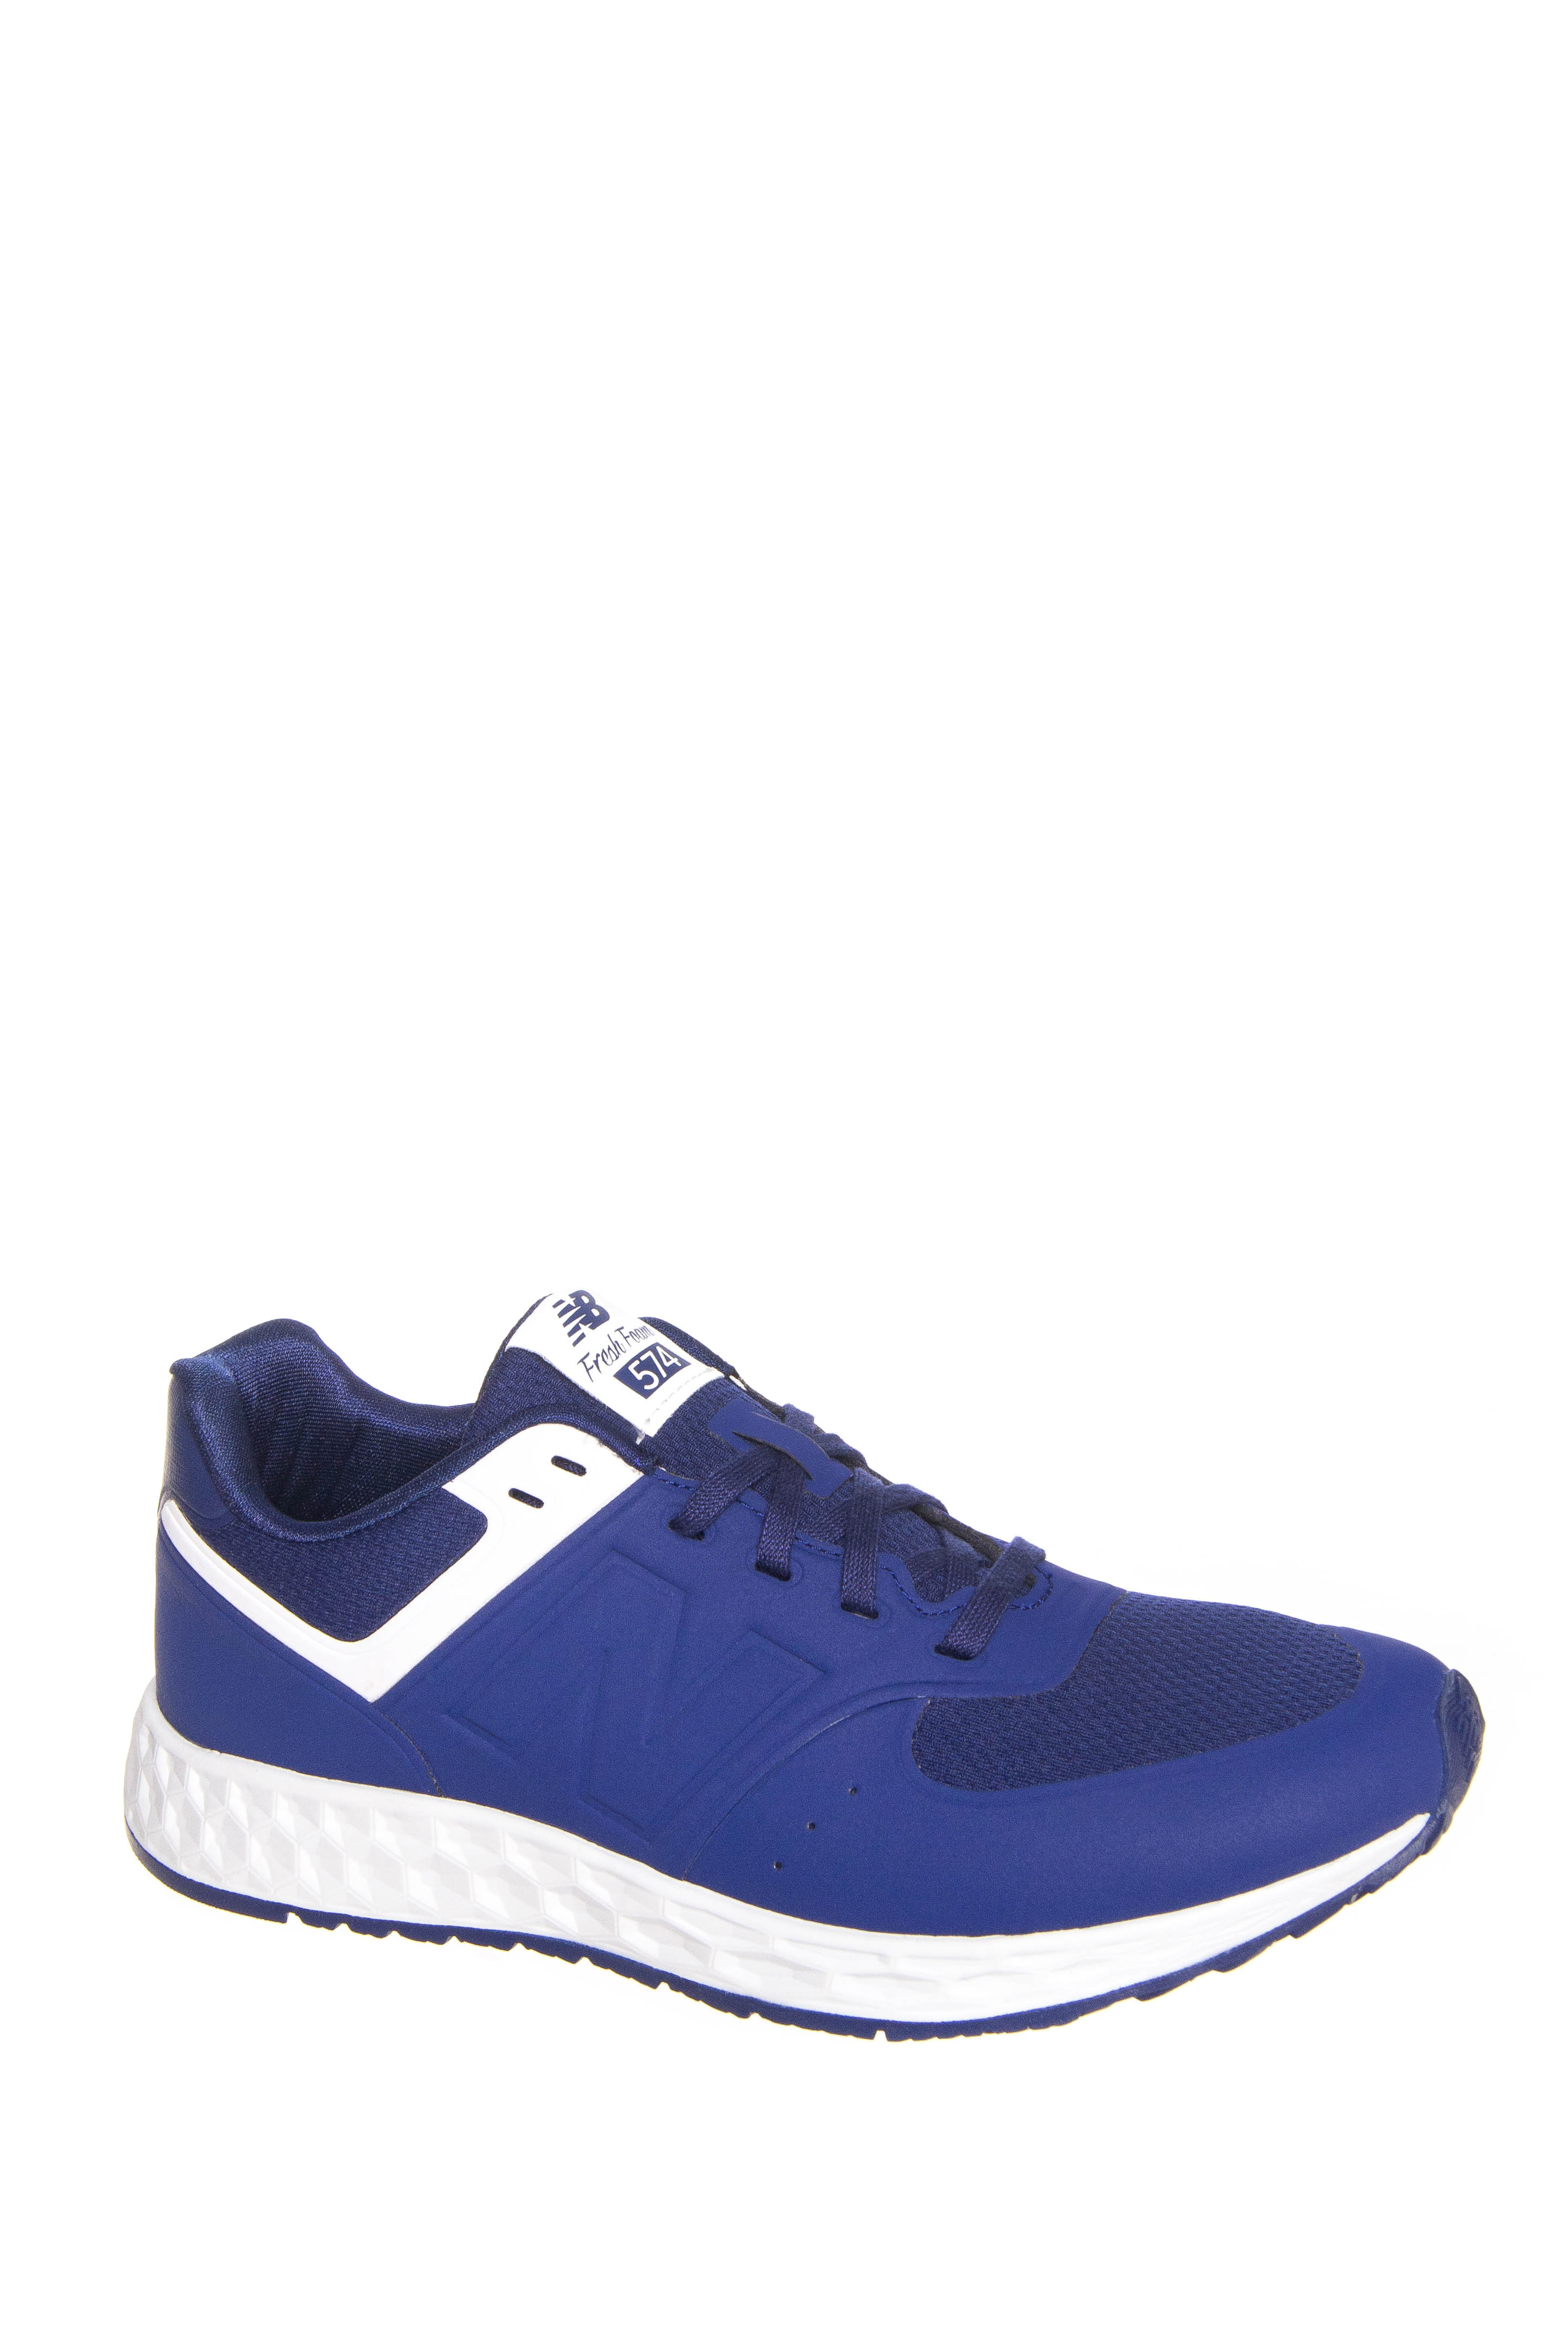 New Balance 598 Fresh Foam Low Top Sneakers - Basin / White